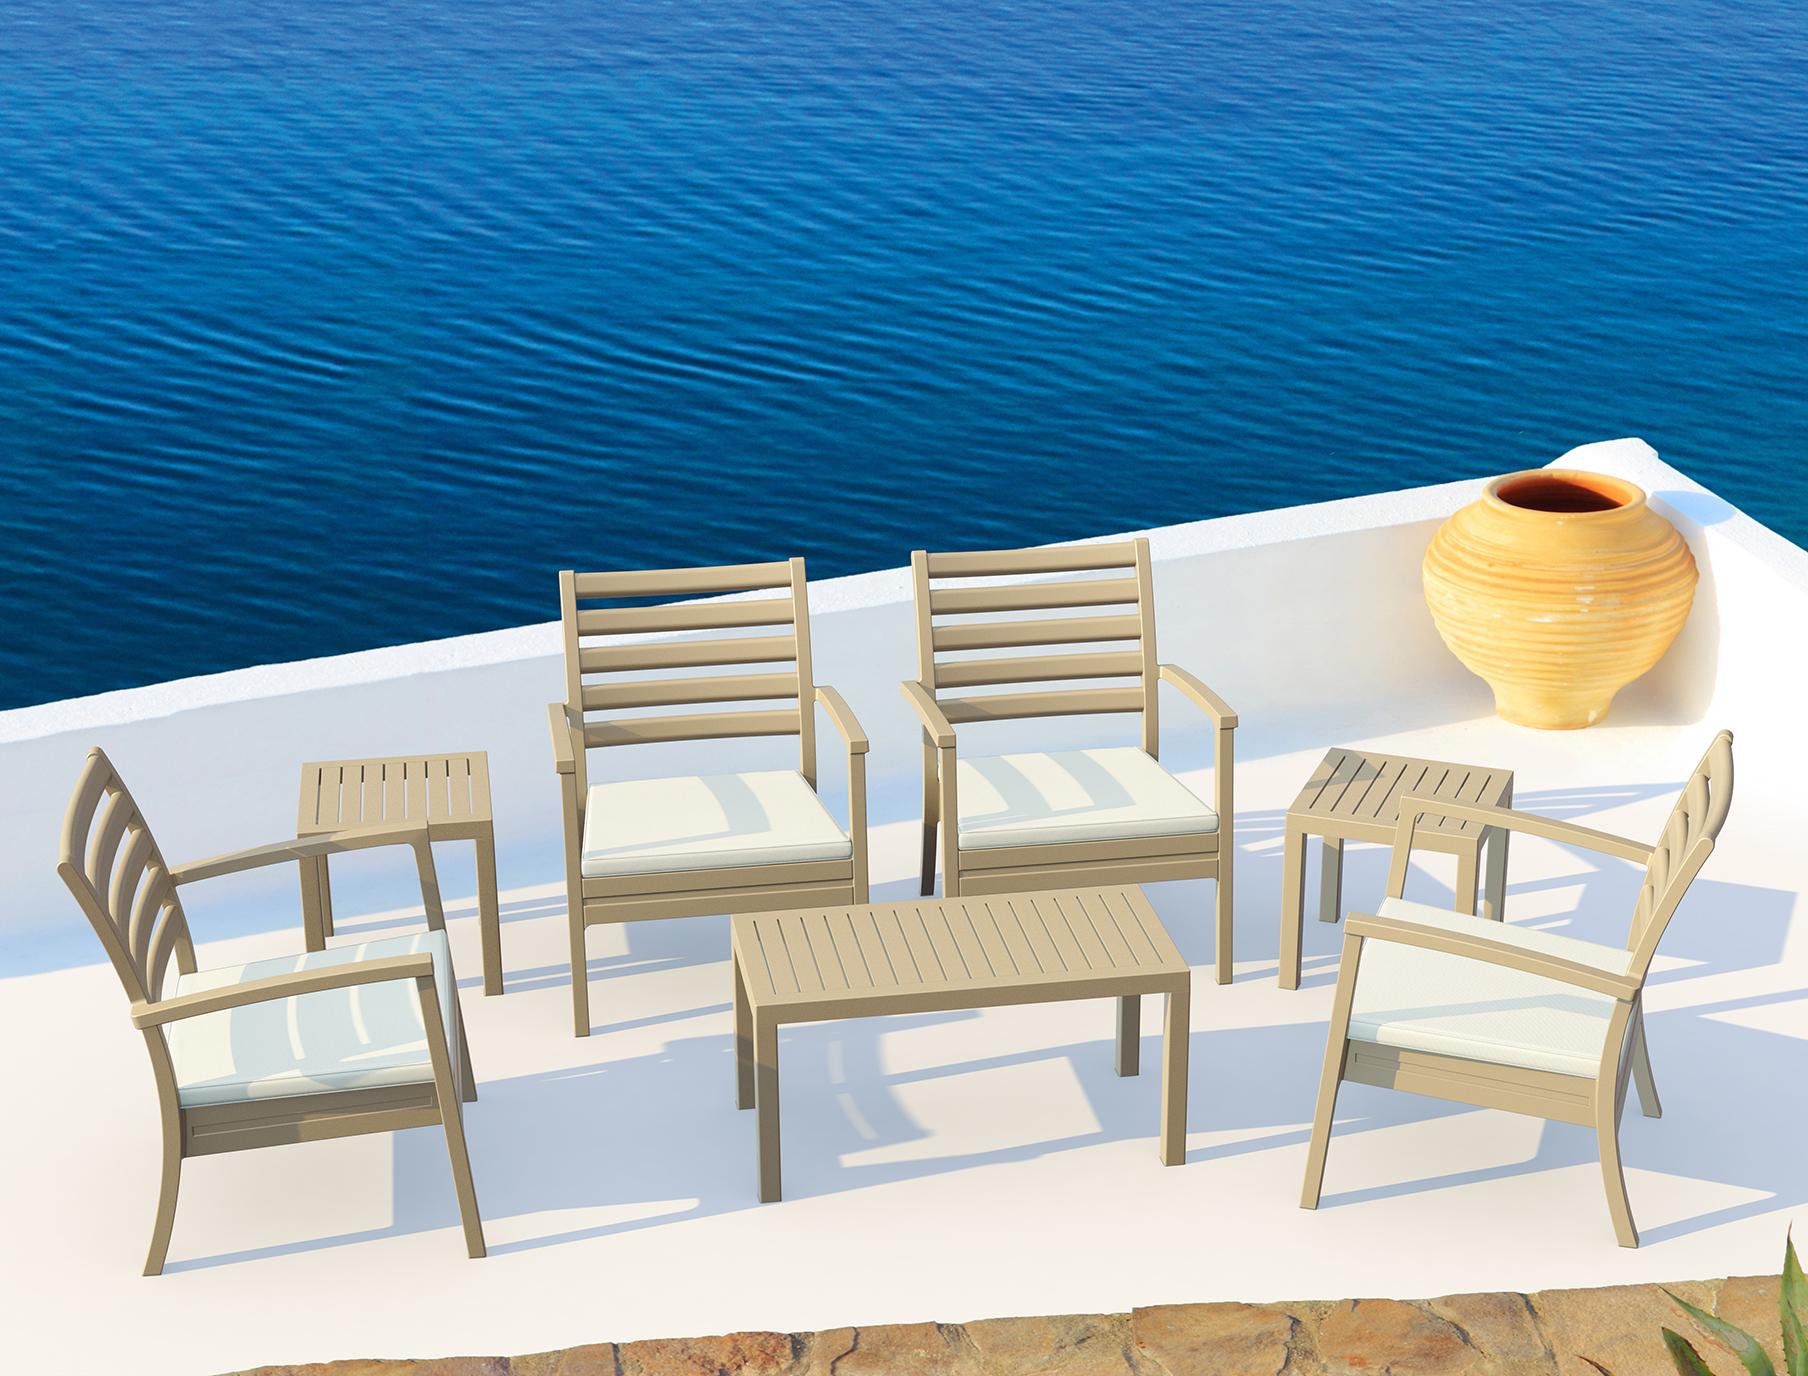 new_contract_gallery_384_artemis_xl_ocean_side_table_ocean_table@2x.jpg